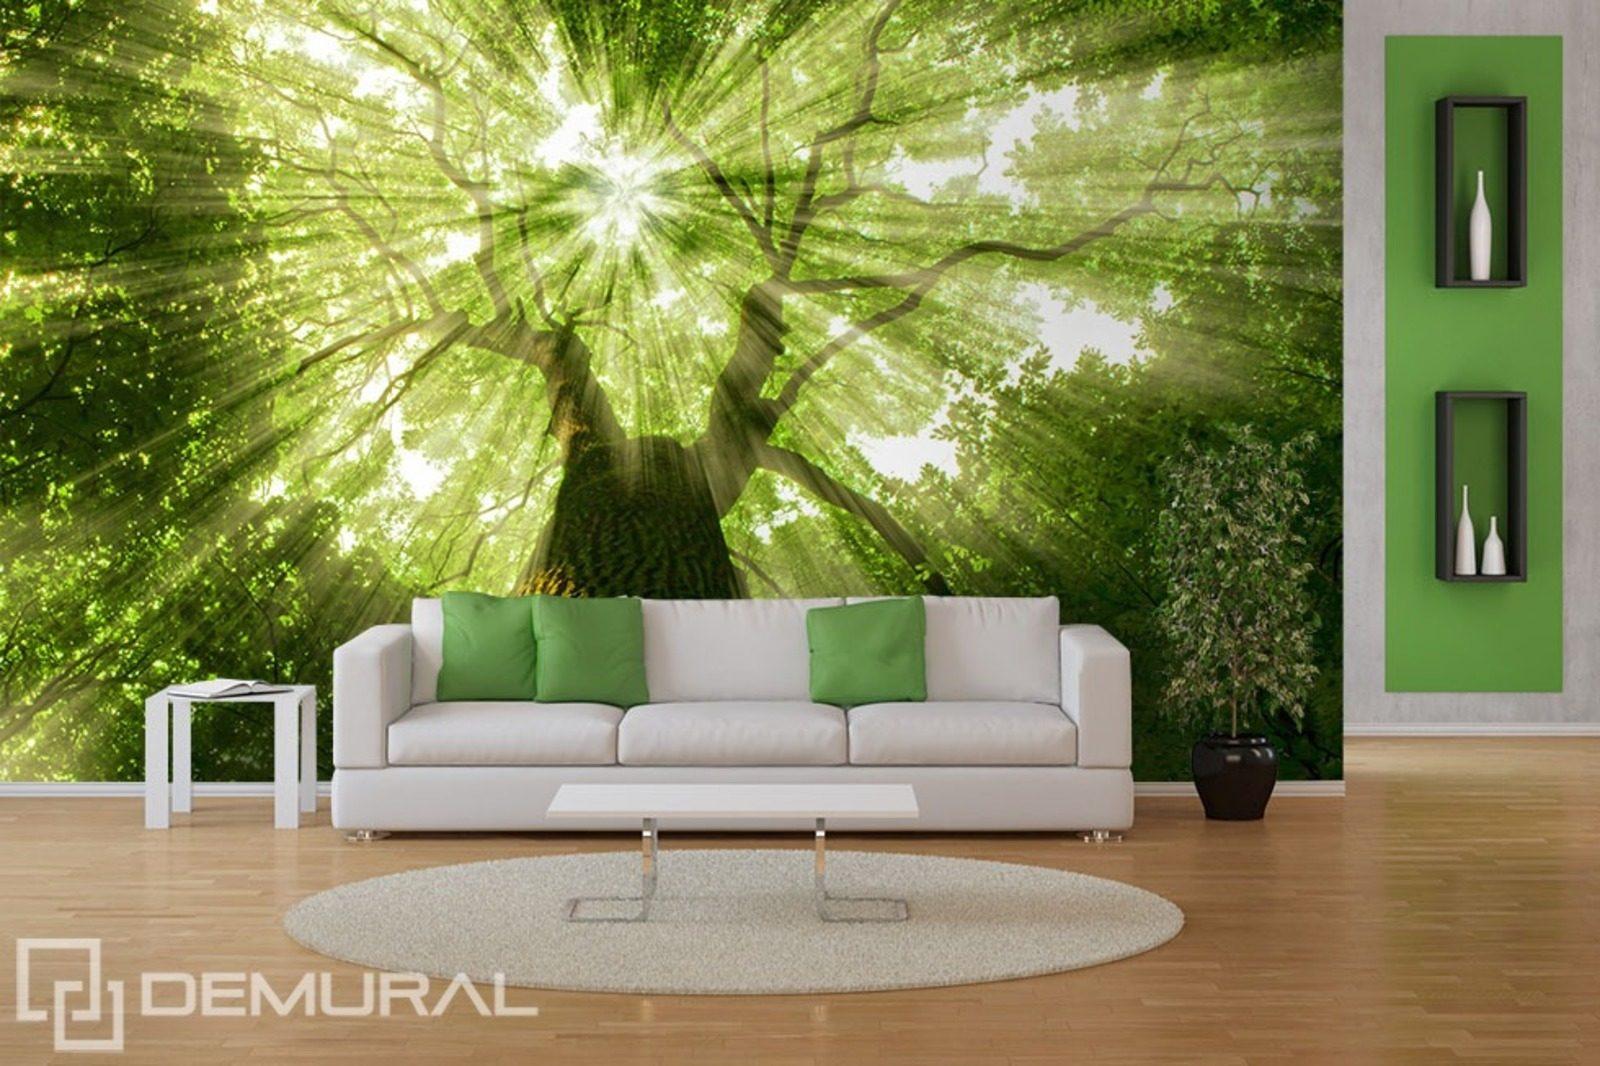 sunbeams in greenery forest wallpaper mural photo window wall mural wall mural ideas uk houseandgarden co uk